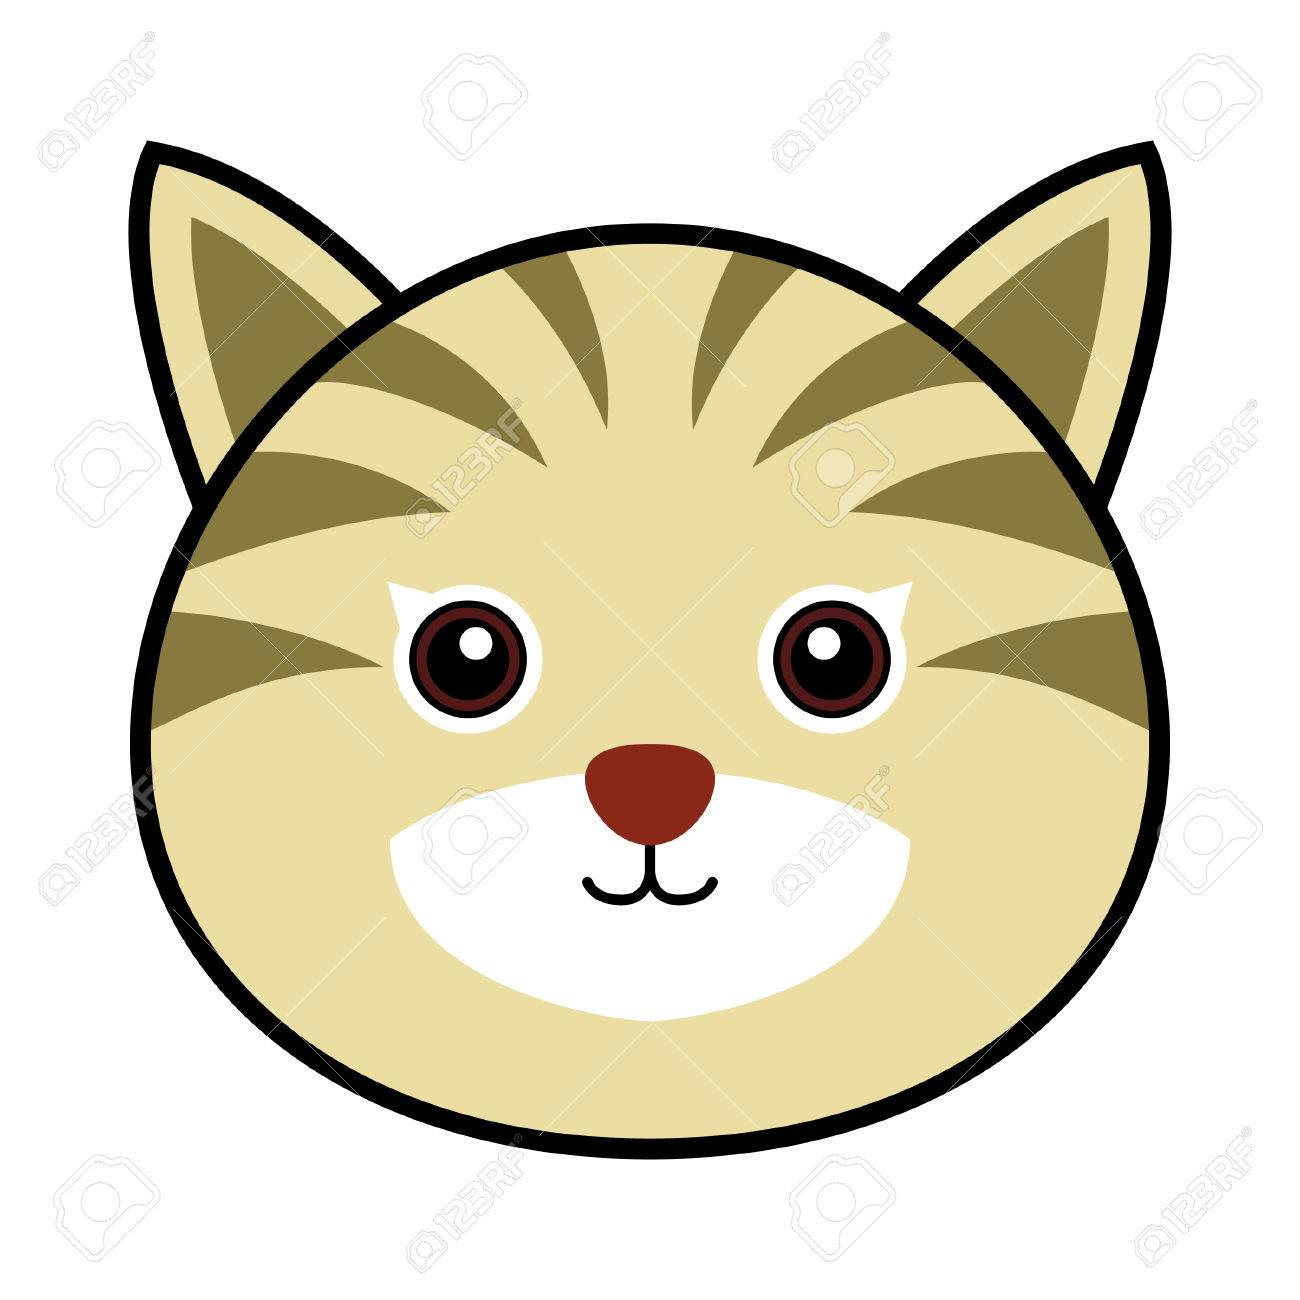 cute cat royalty free cliparts vectors and stock illustration rh 123rf com cat face clipart outline cat face clipart black and white free